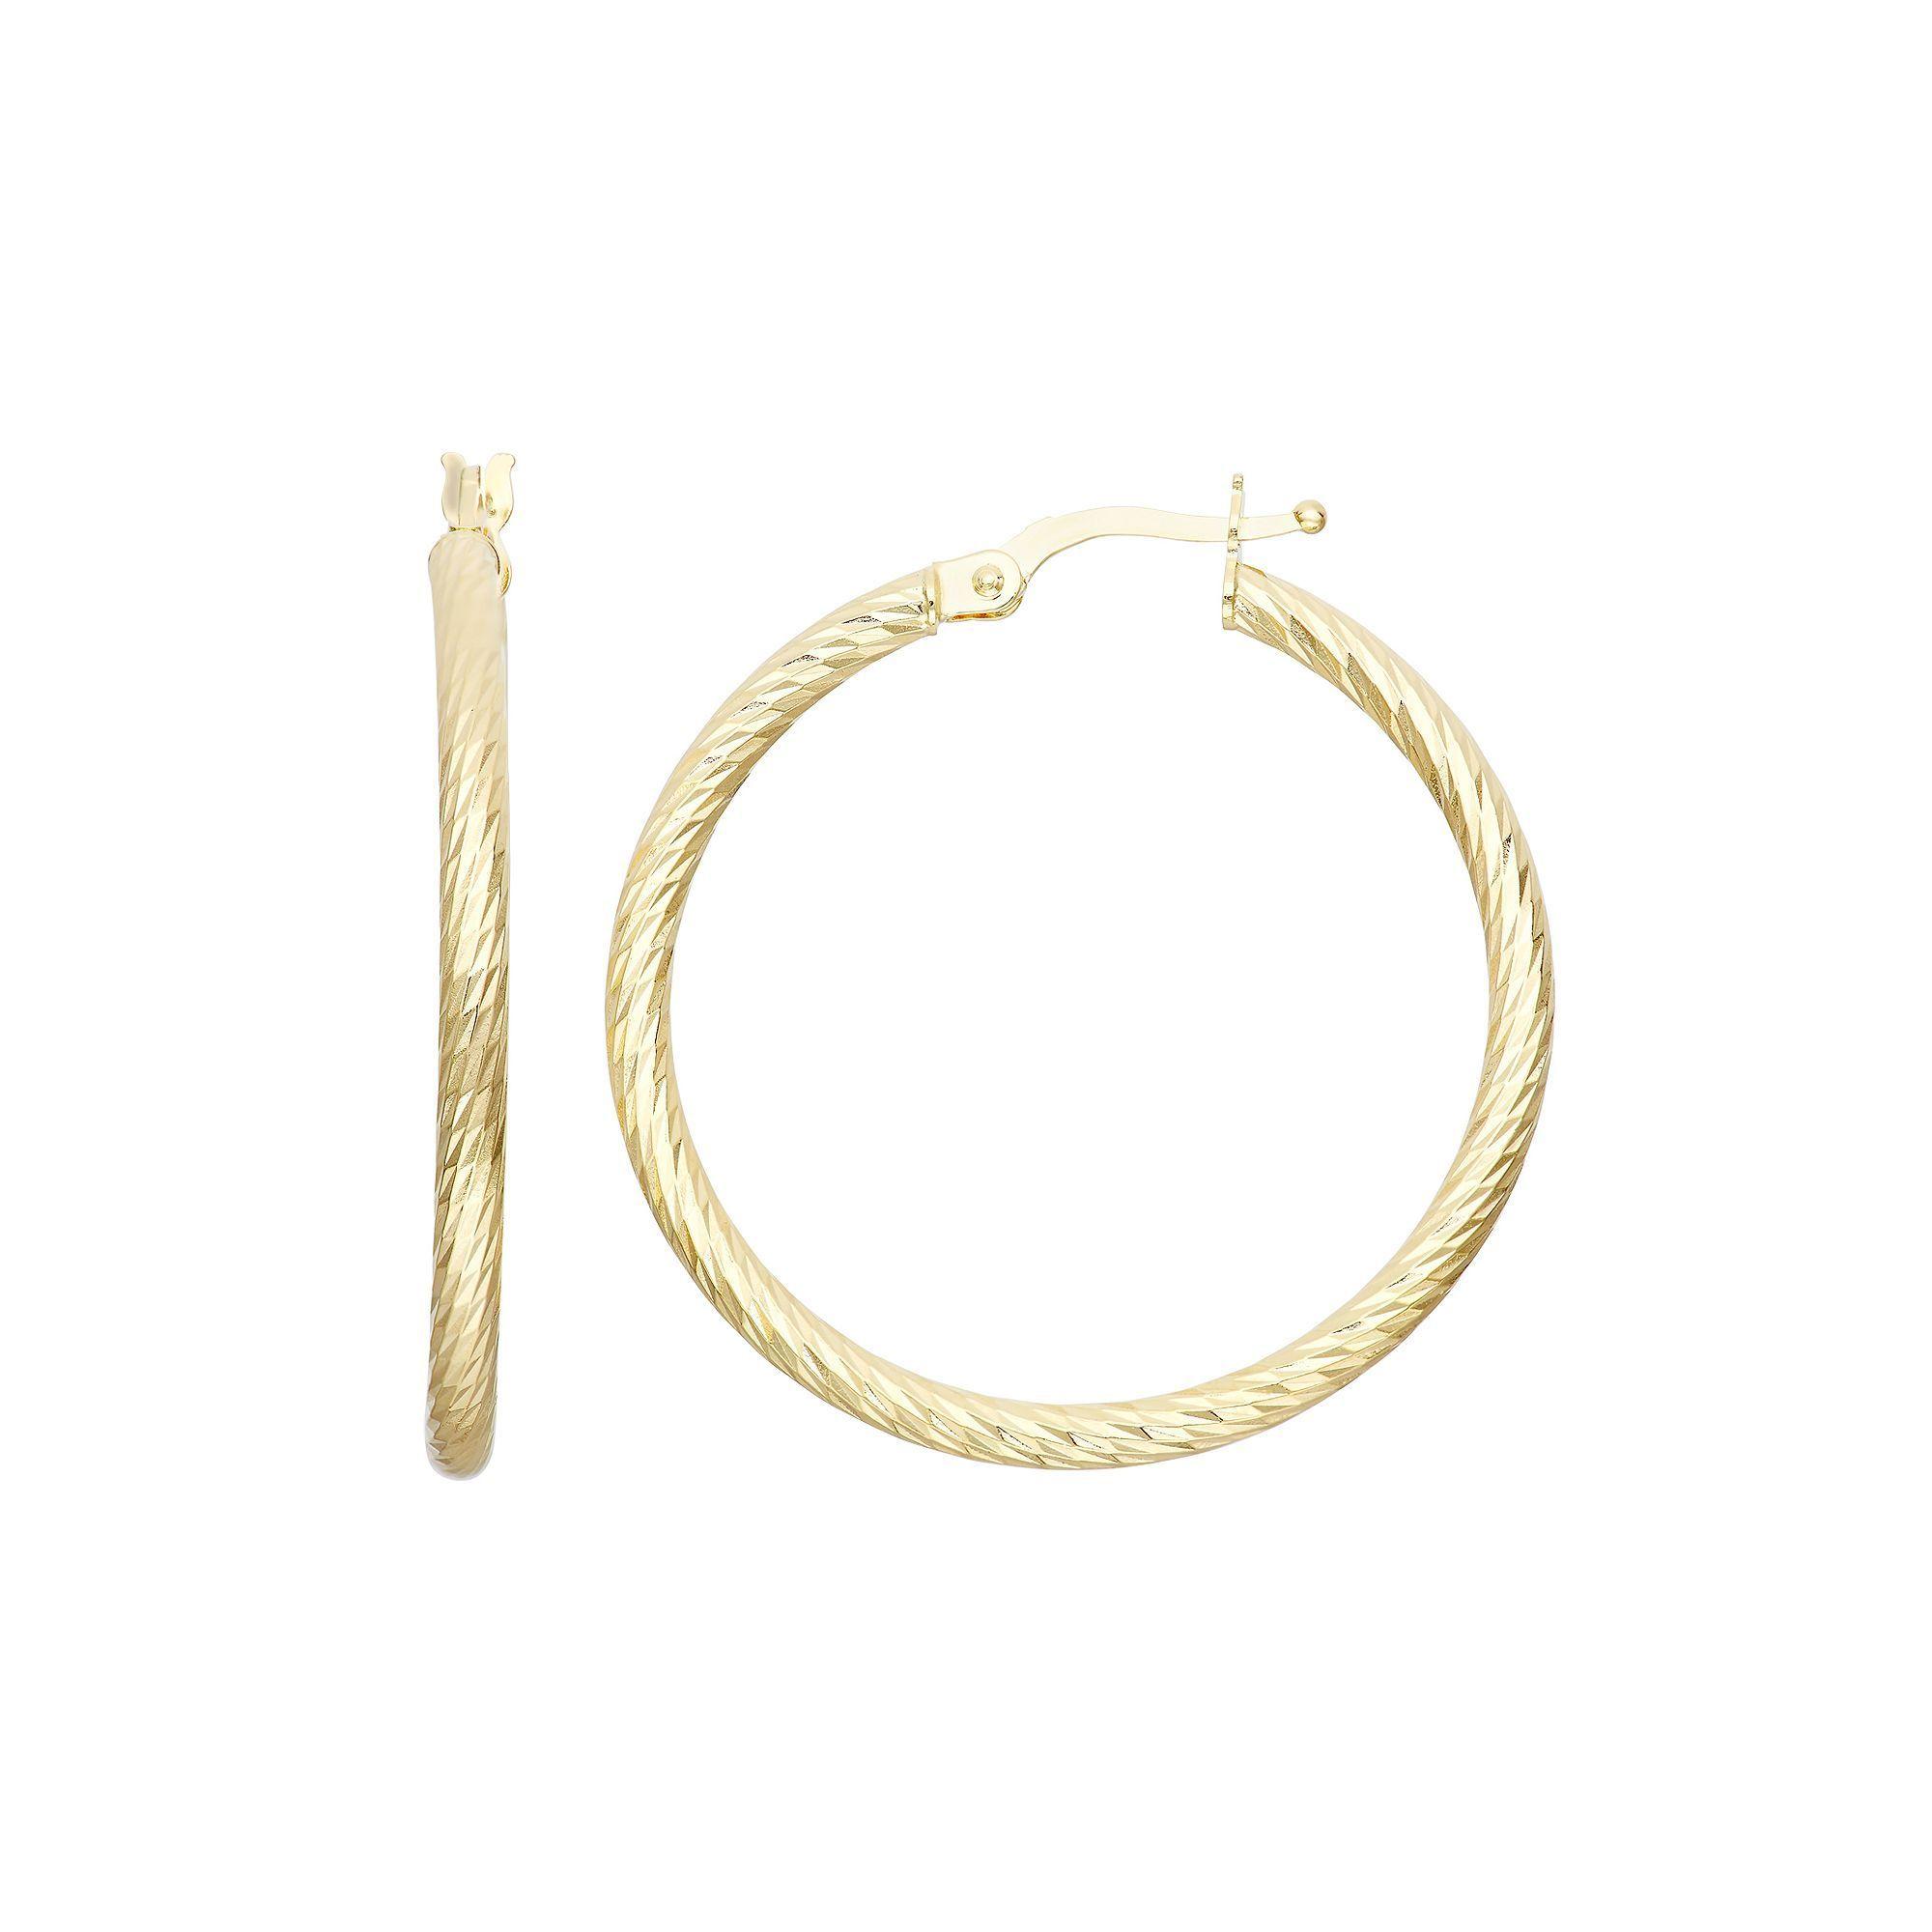 Kohl S 14k Gold Textured Hoop Earrings Products